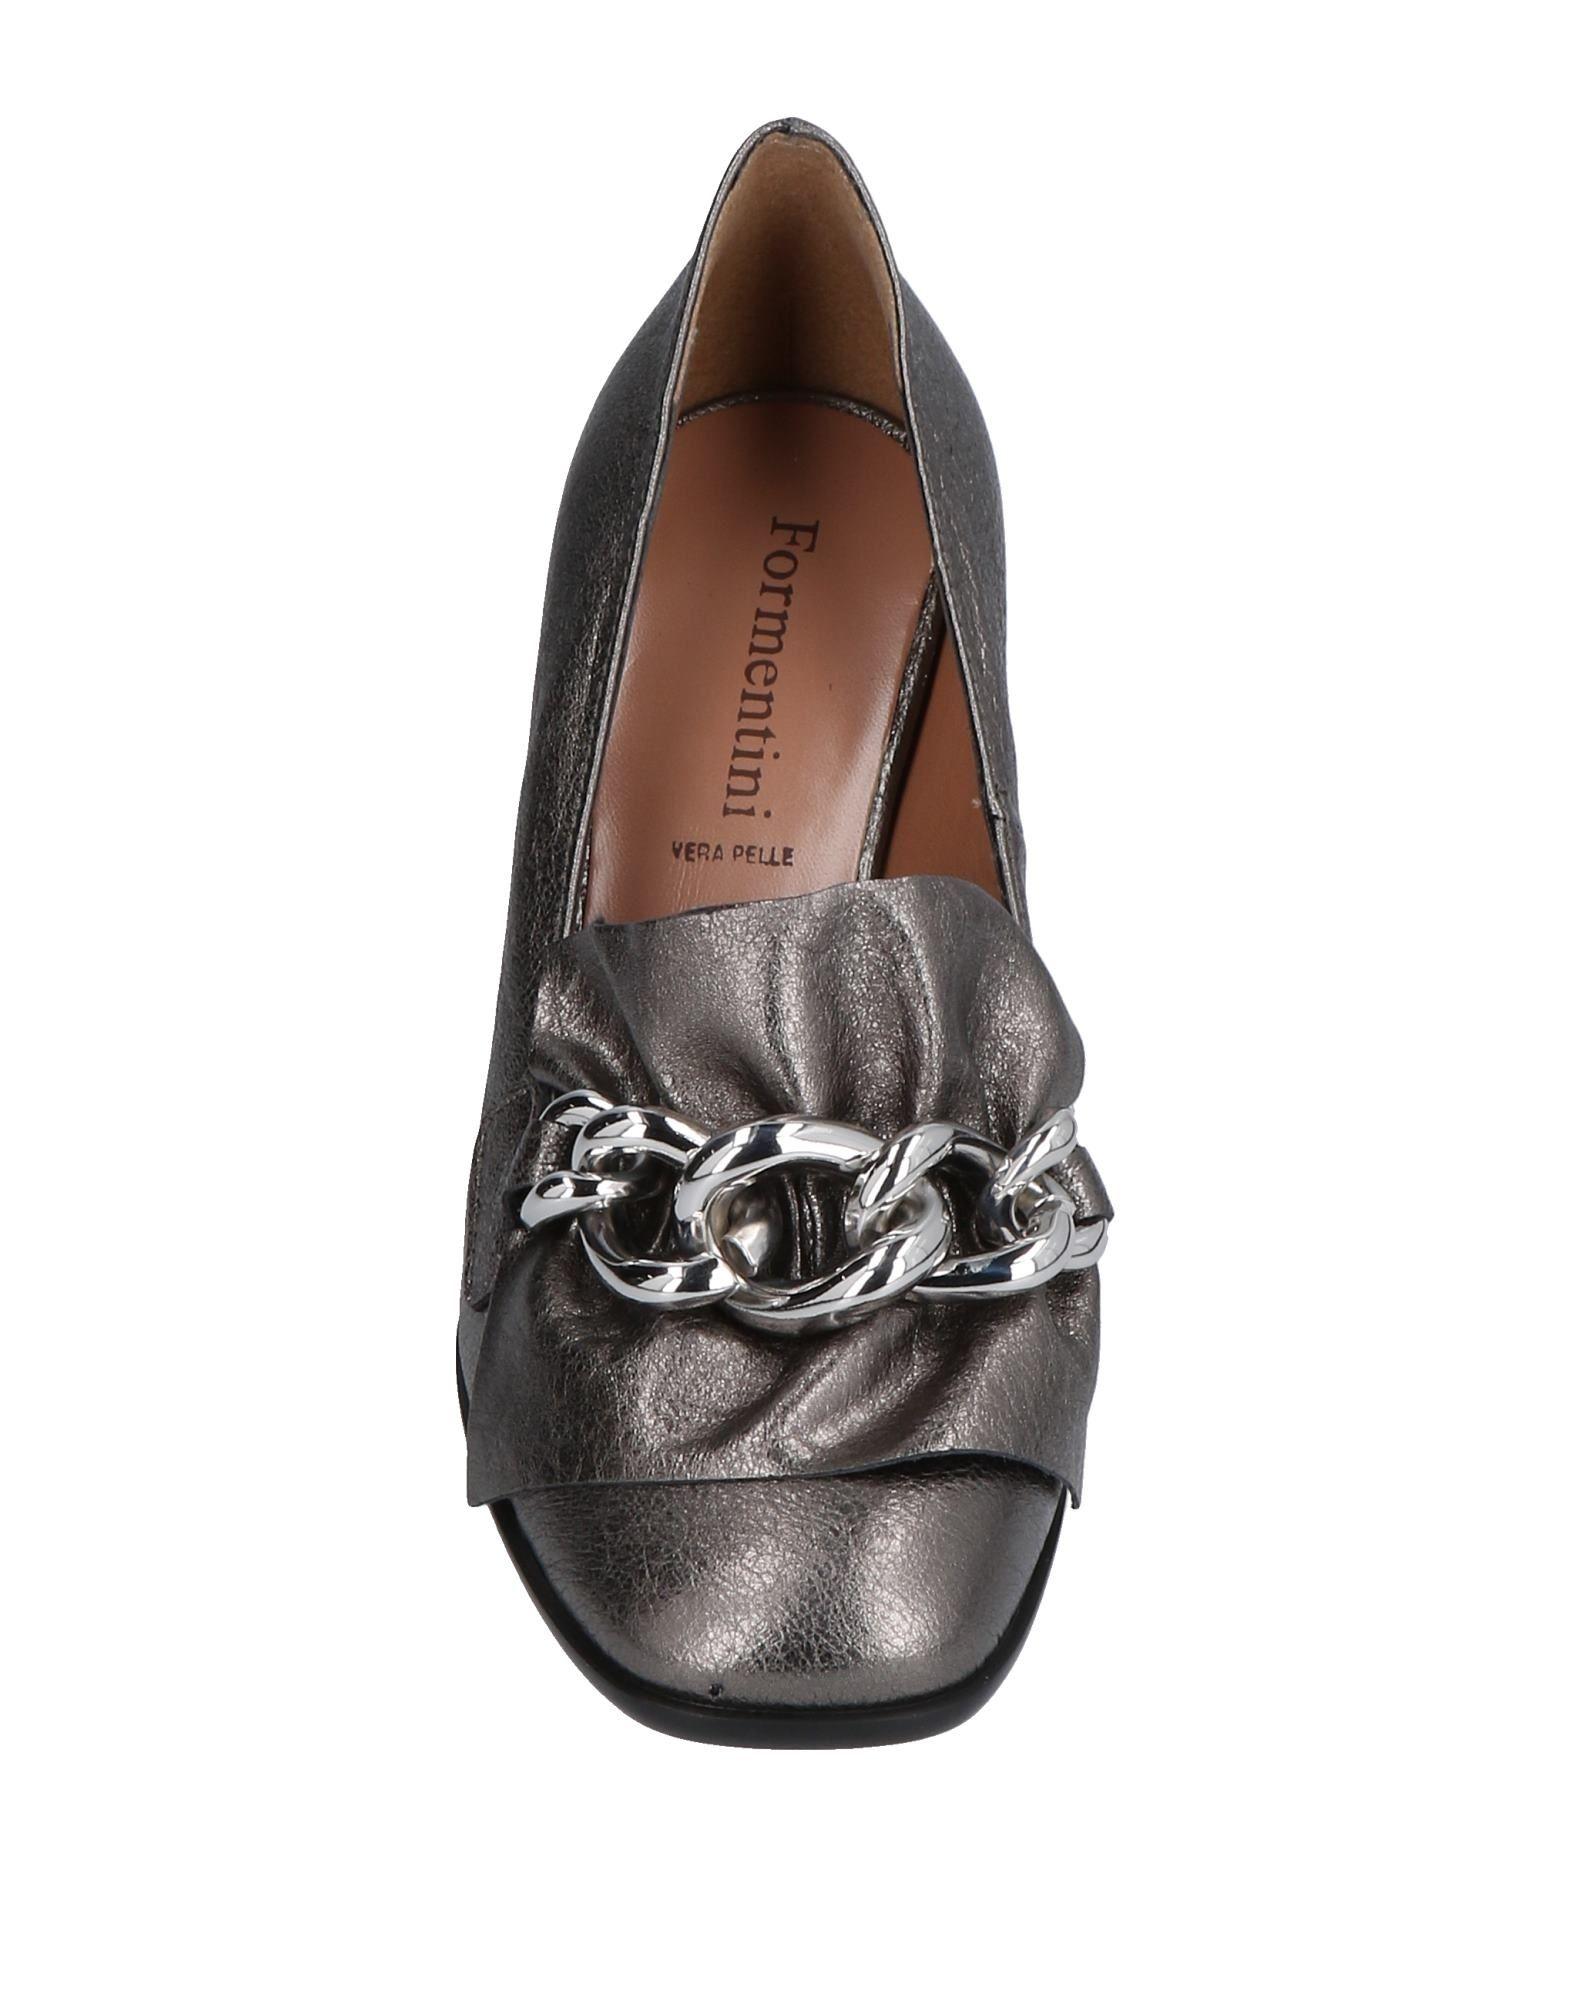 Formentini Gute Mokassins Damen  11479408DQ Gute Formentini Qualität beliebte Schuhe 5d02bb